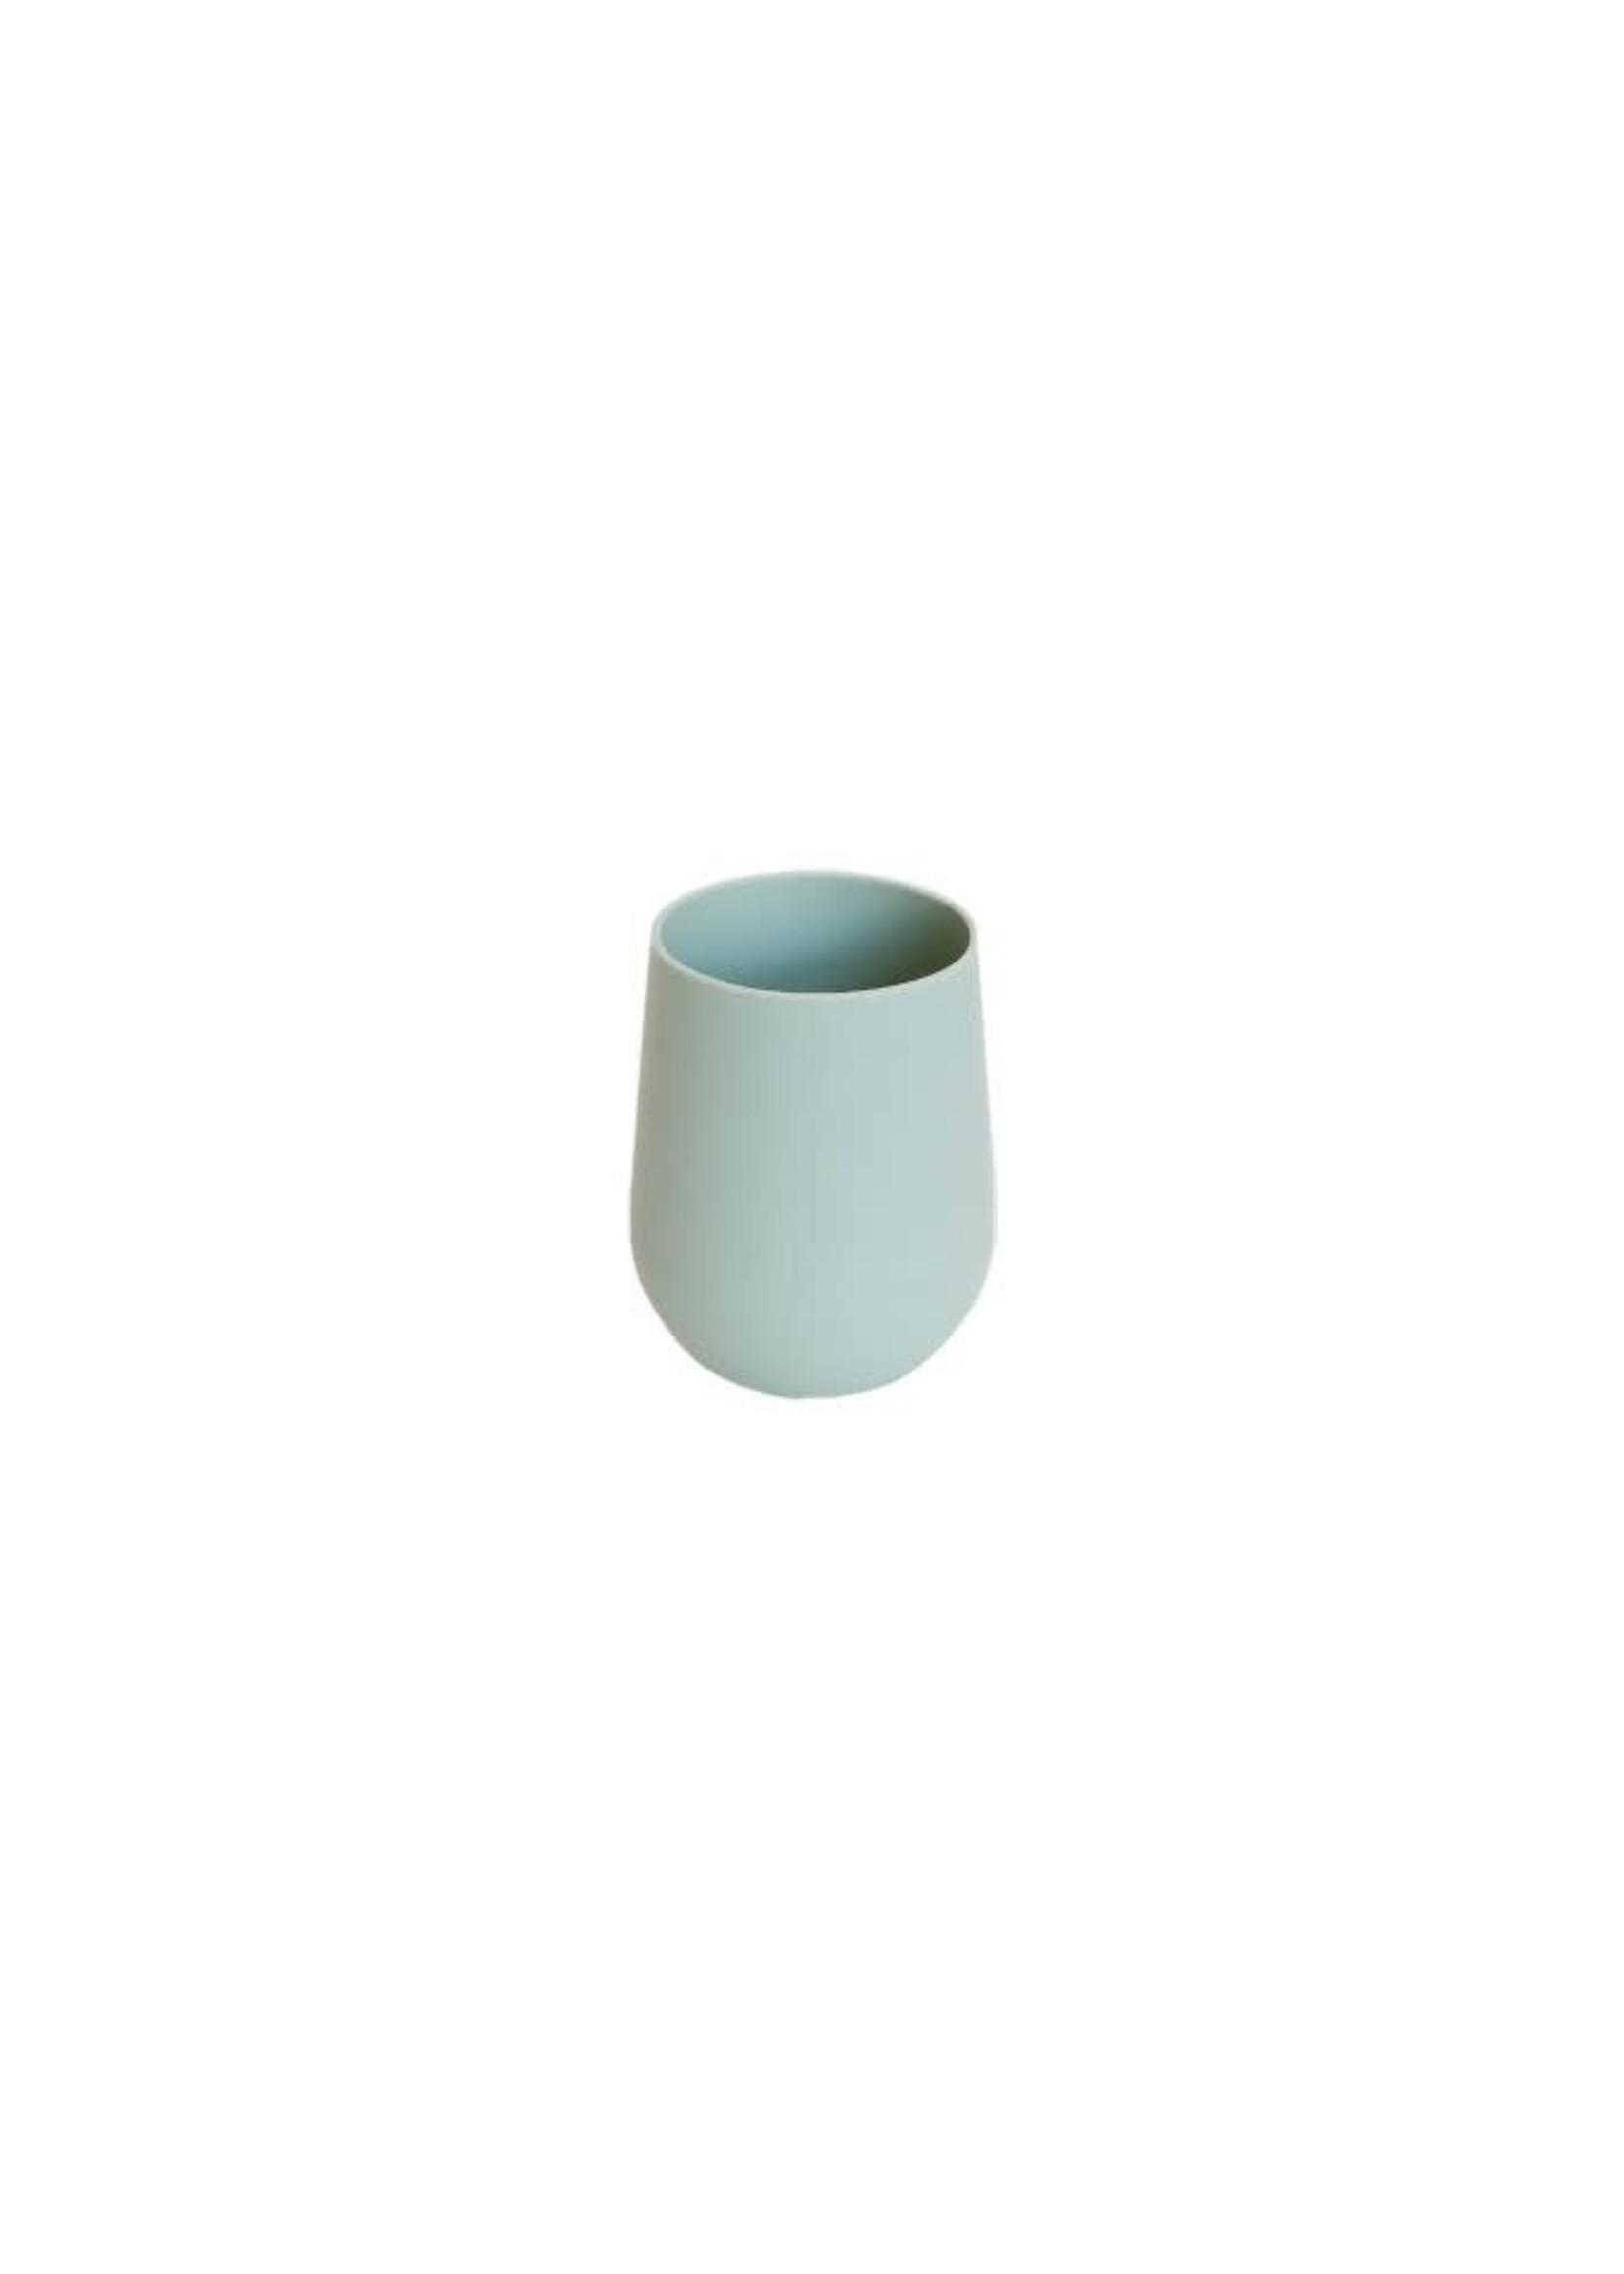 EZPZ ezpz Mini Cup (Sage)